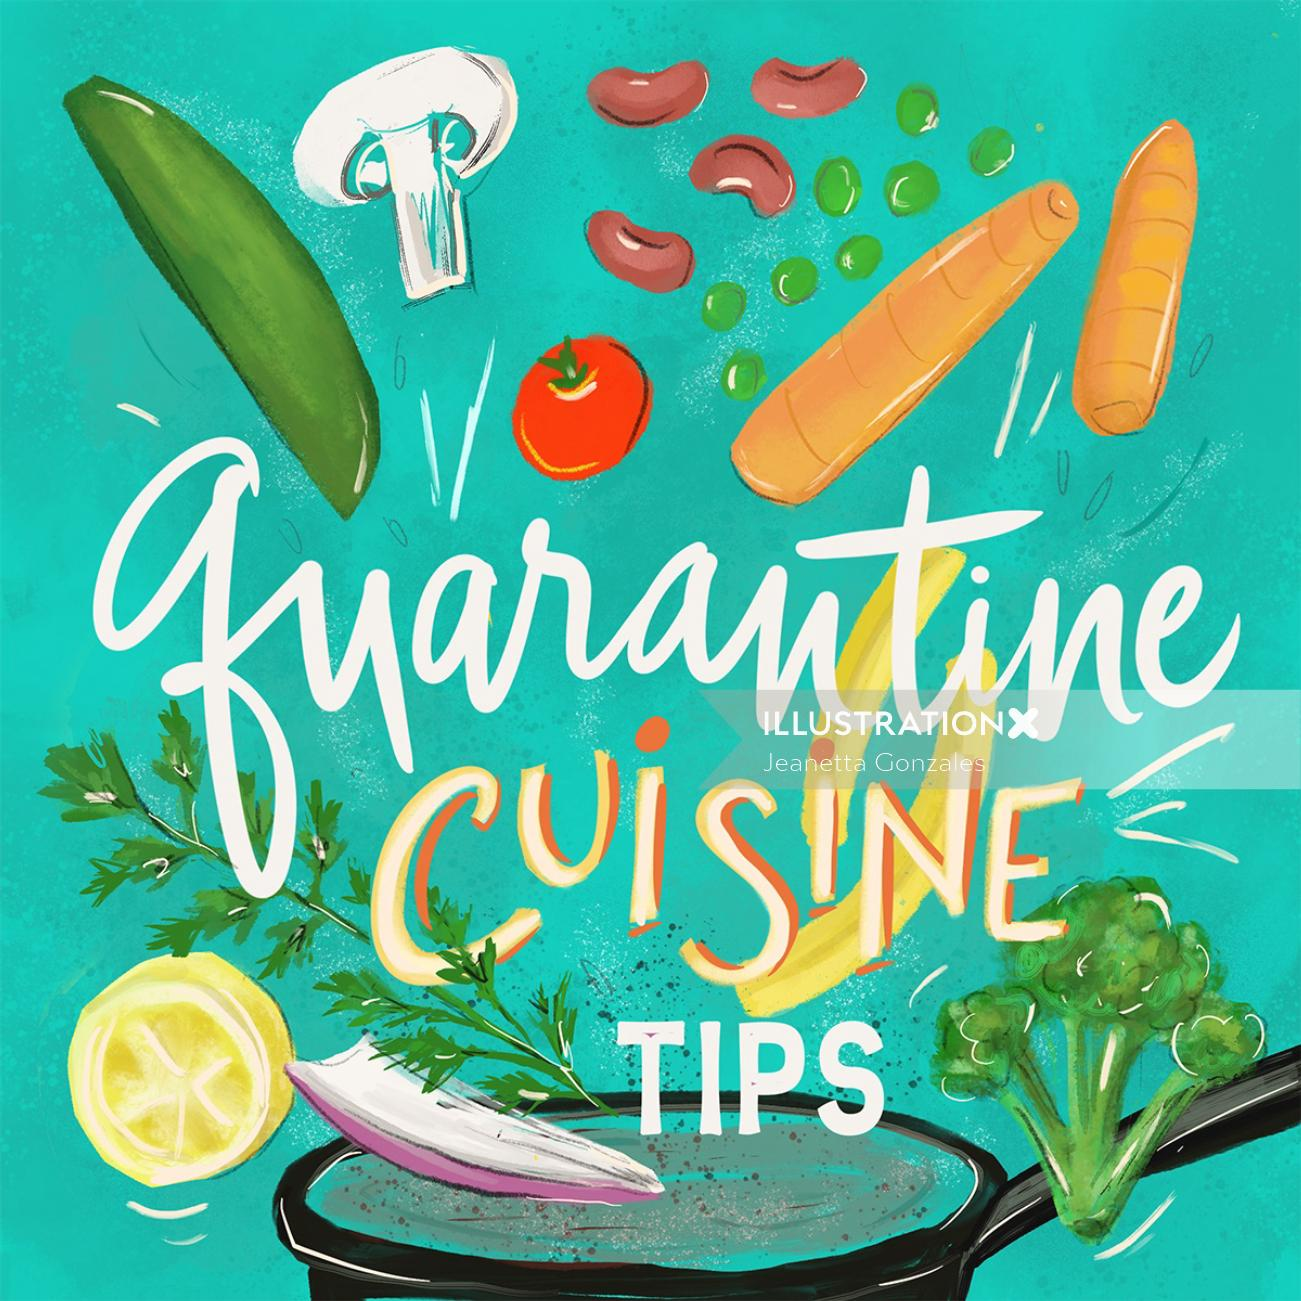 Typography art of quarantine cuisine tips